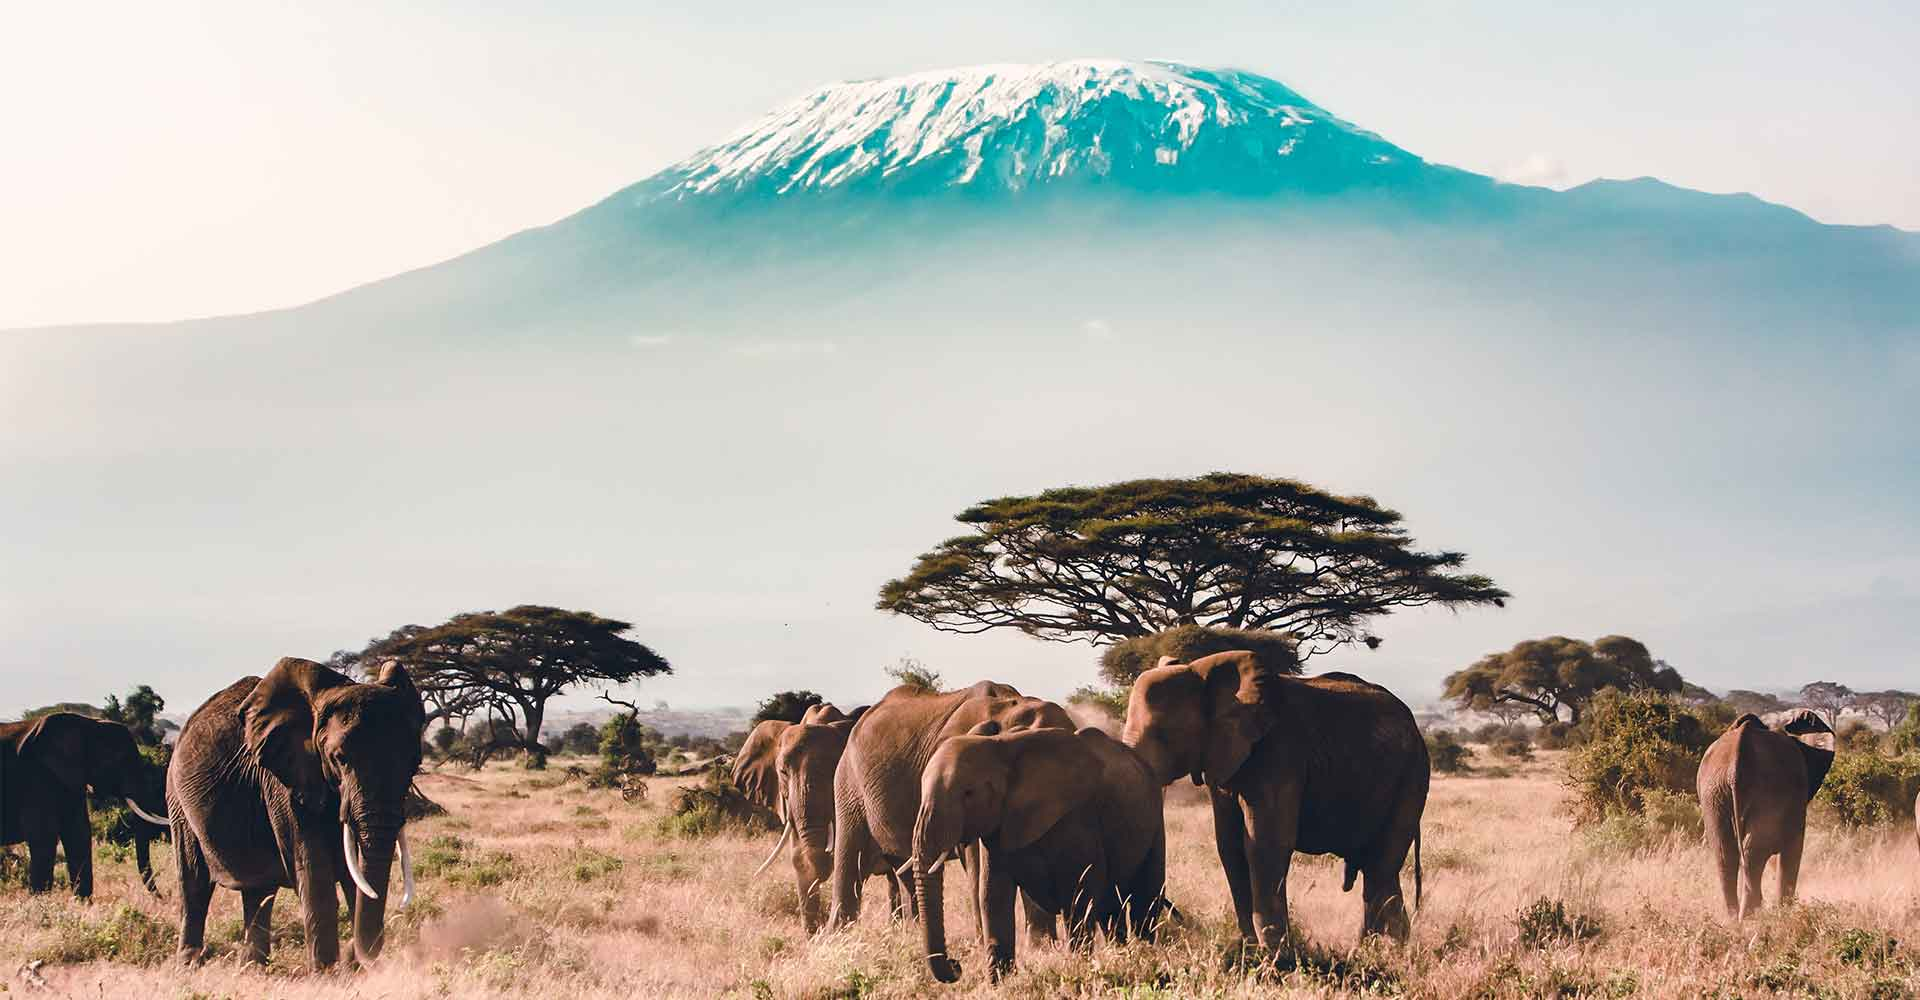 Banner image of Tanzania